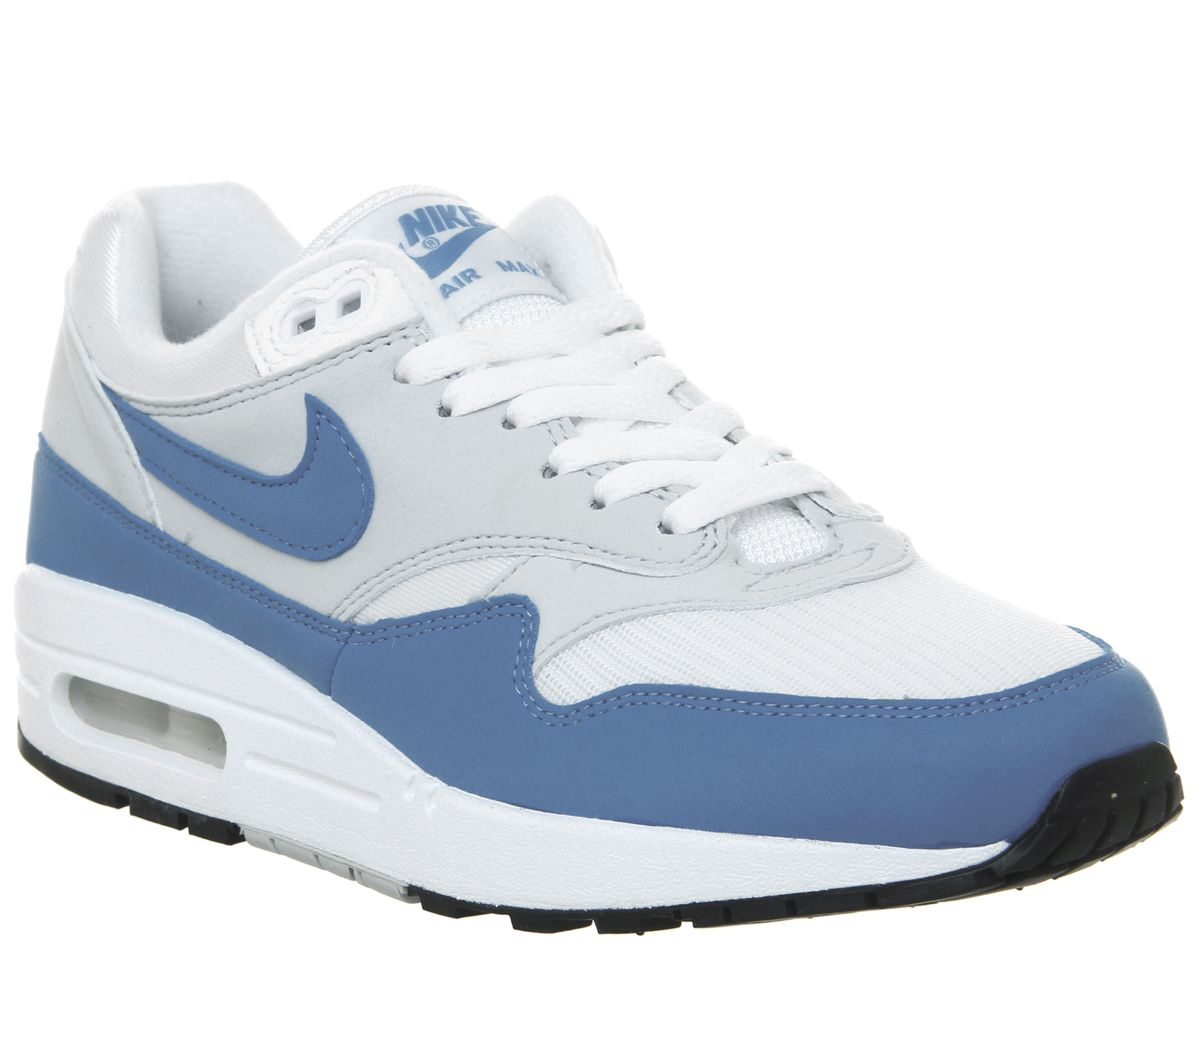 27b5067eda Nike Air Max 1 Trainers White University Blue - Hers trainers